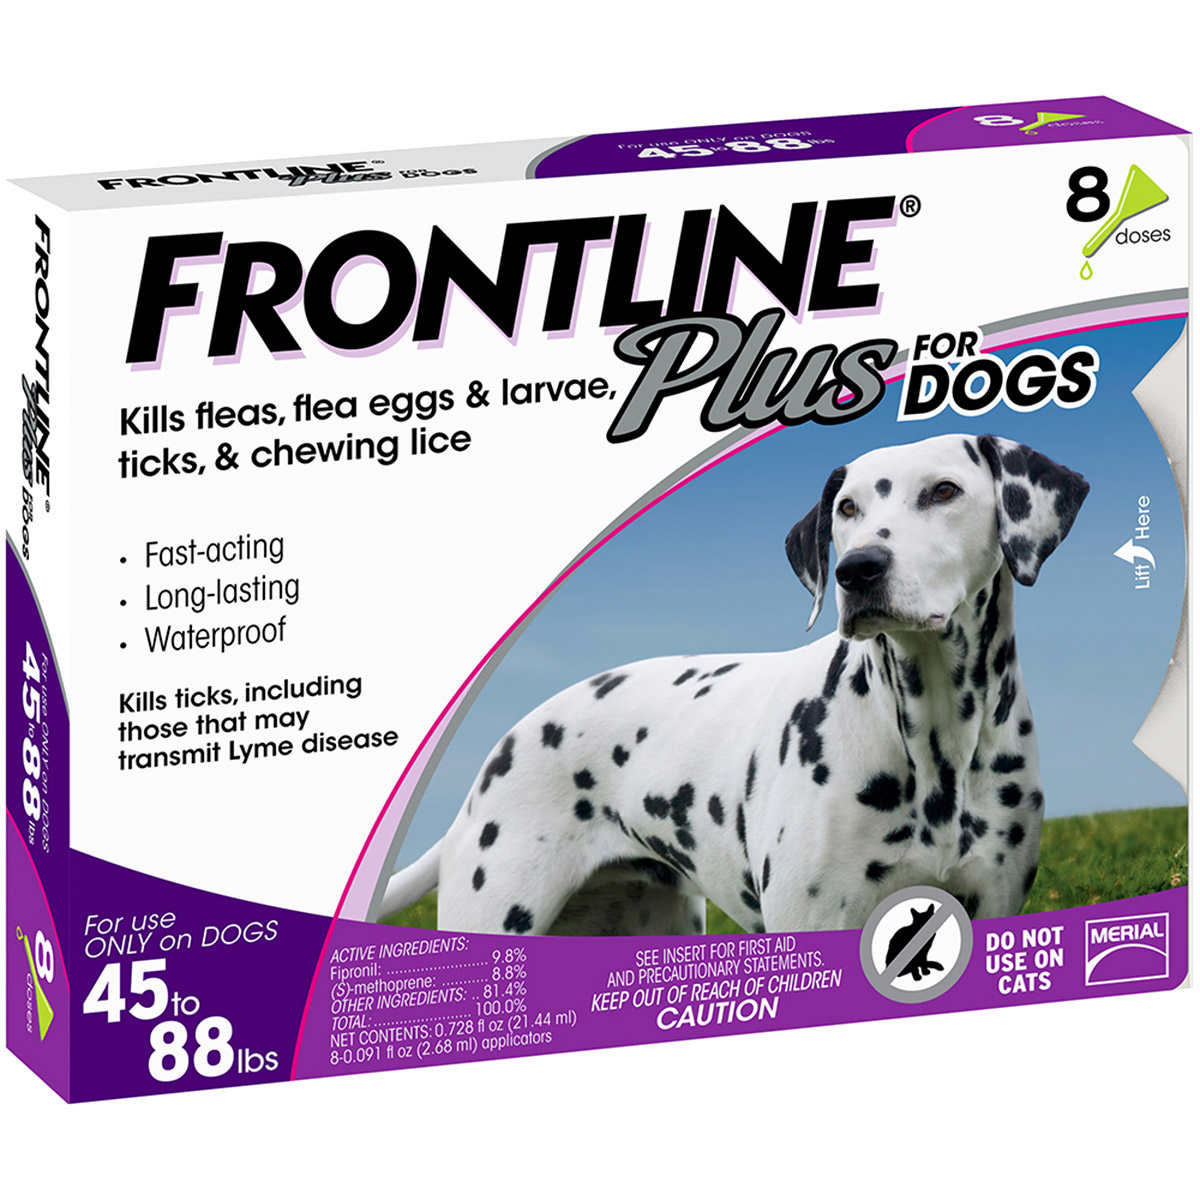 Frontline Plus Dog 45 88 Lb 8 Single Doses